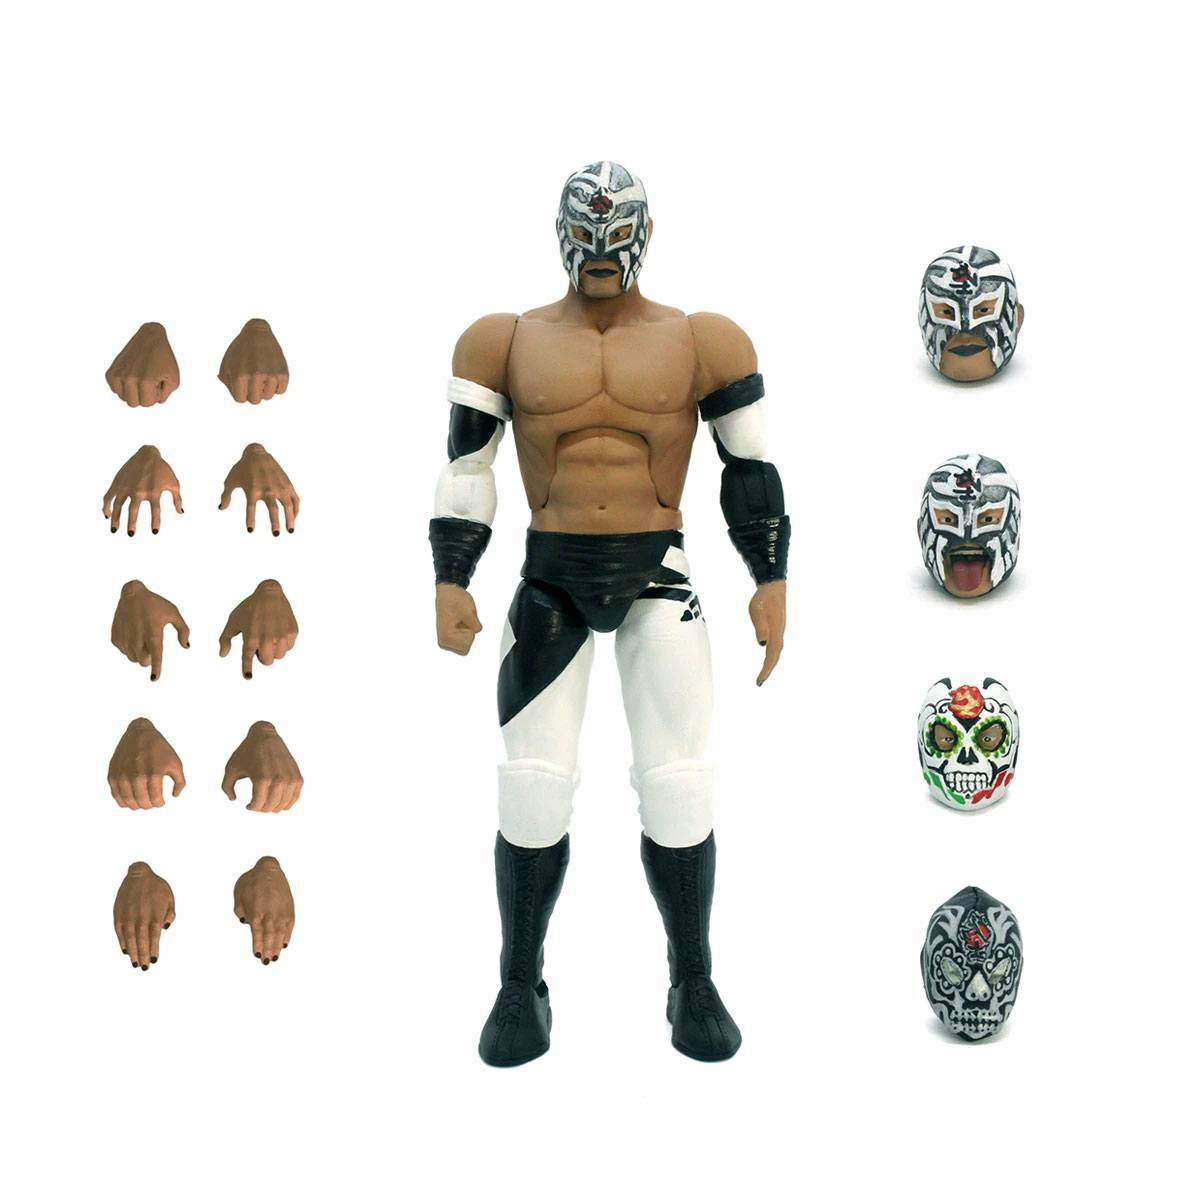 New Japan Pro-Wrestling Ultimates Action Figure Wave 2 Bushi 18 cm